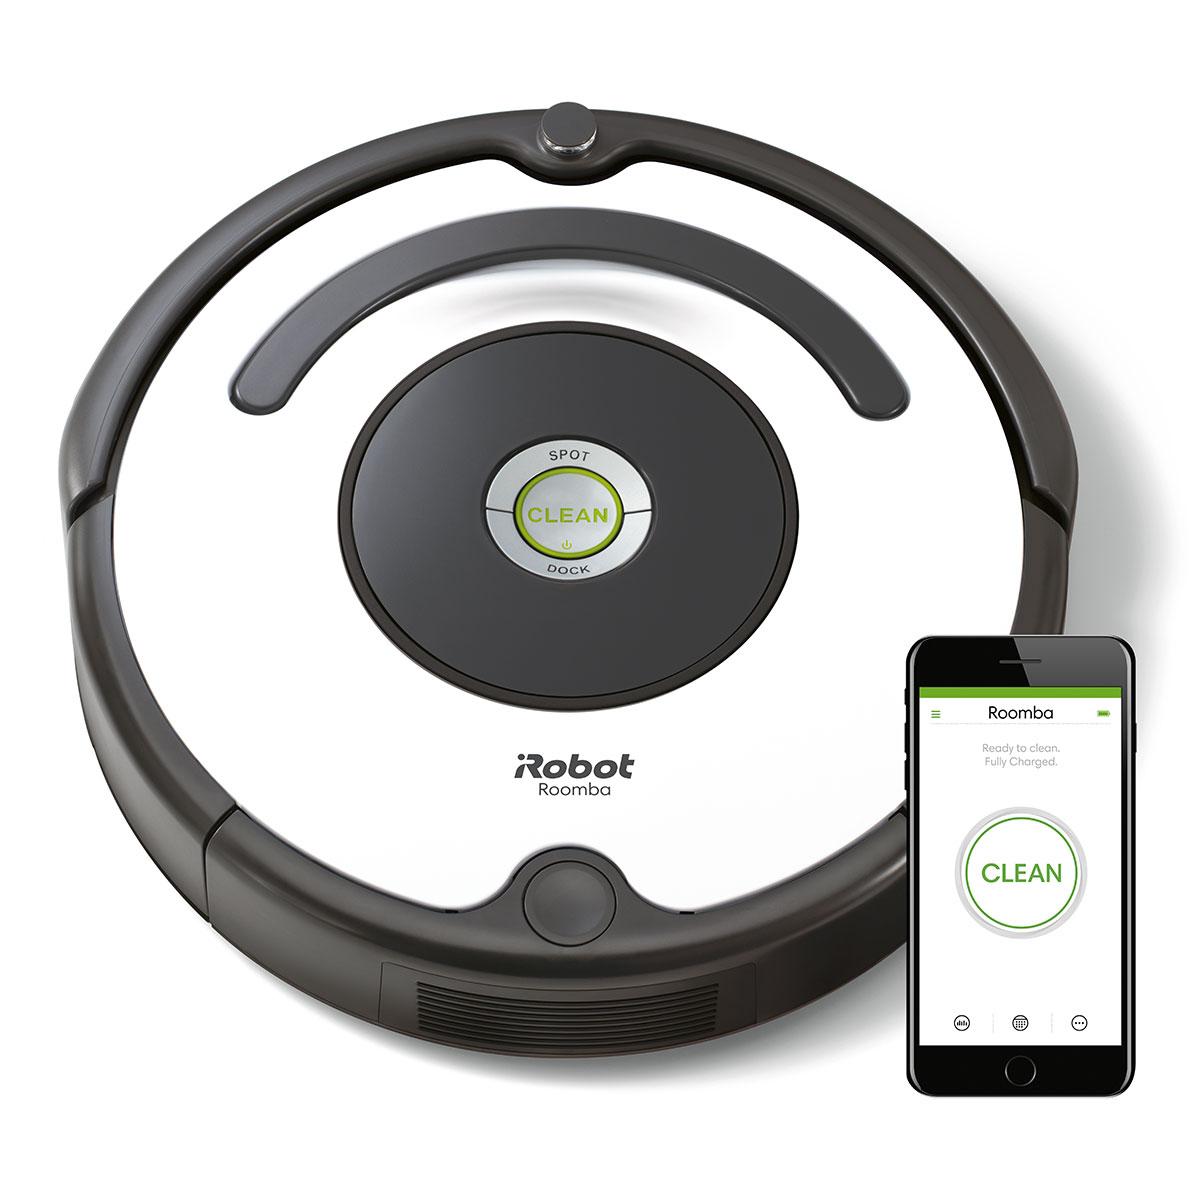 iRobot robotstøvsuger - Roomba 675